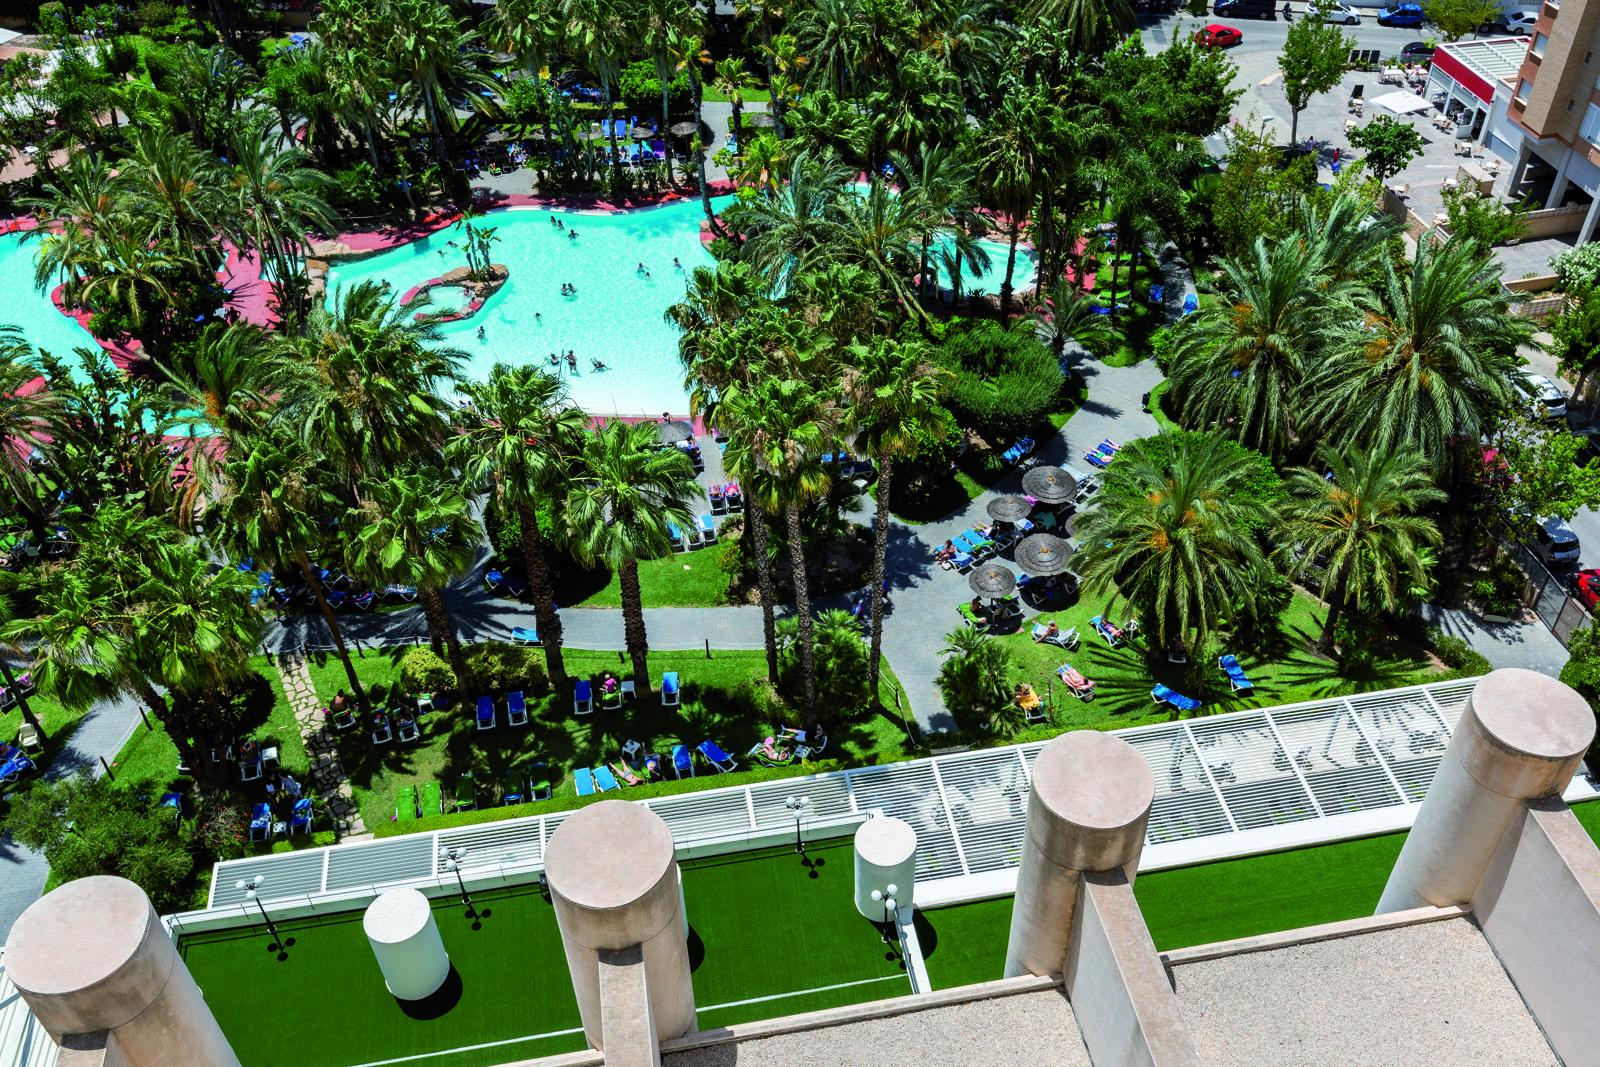 Melià Benidorm chooses Saxun to help expand its hotel space